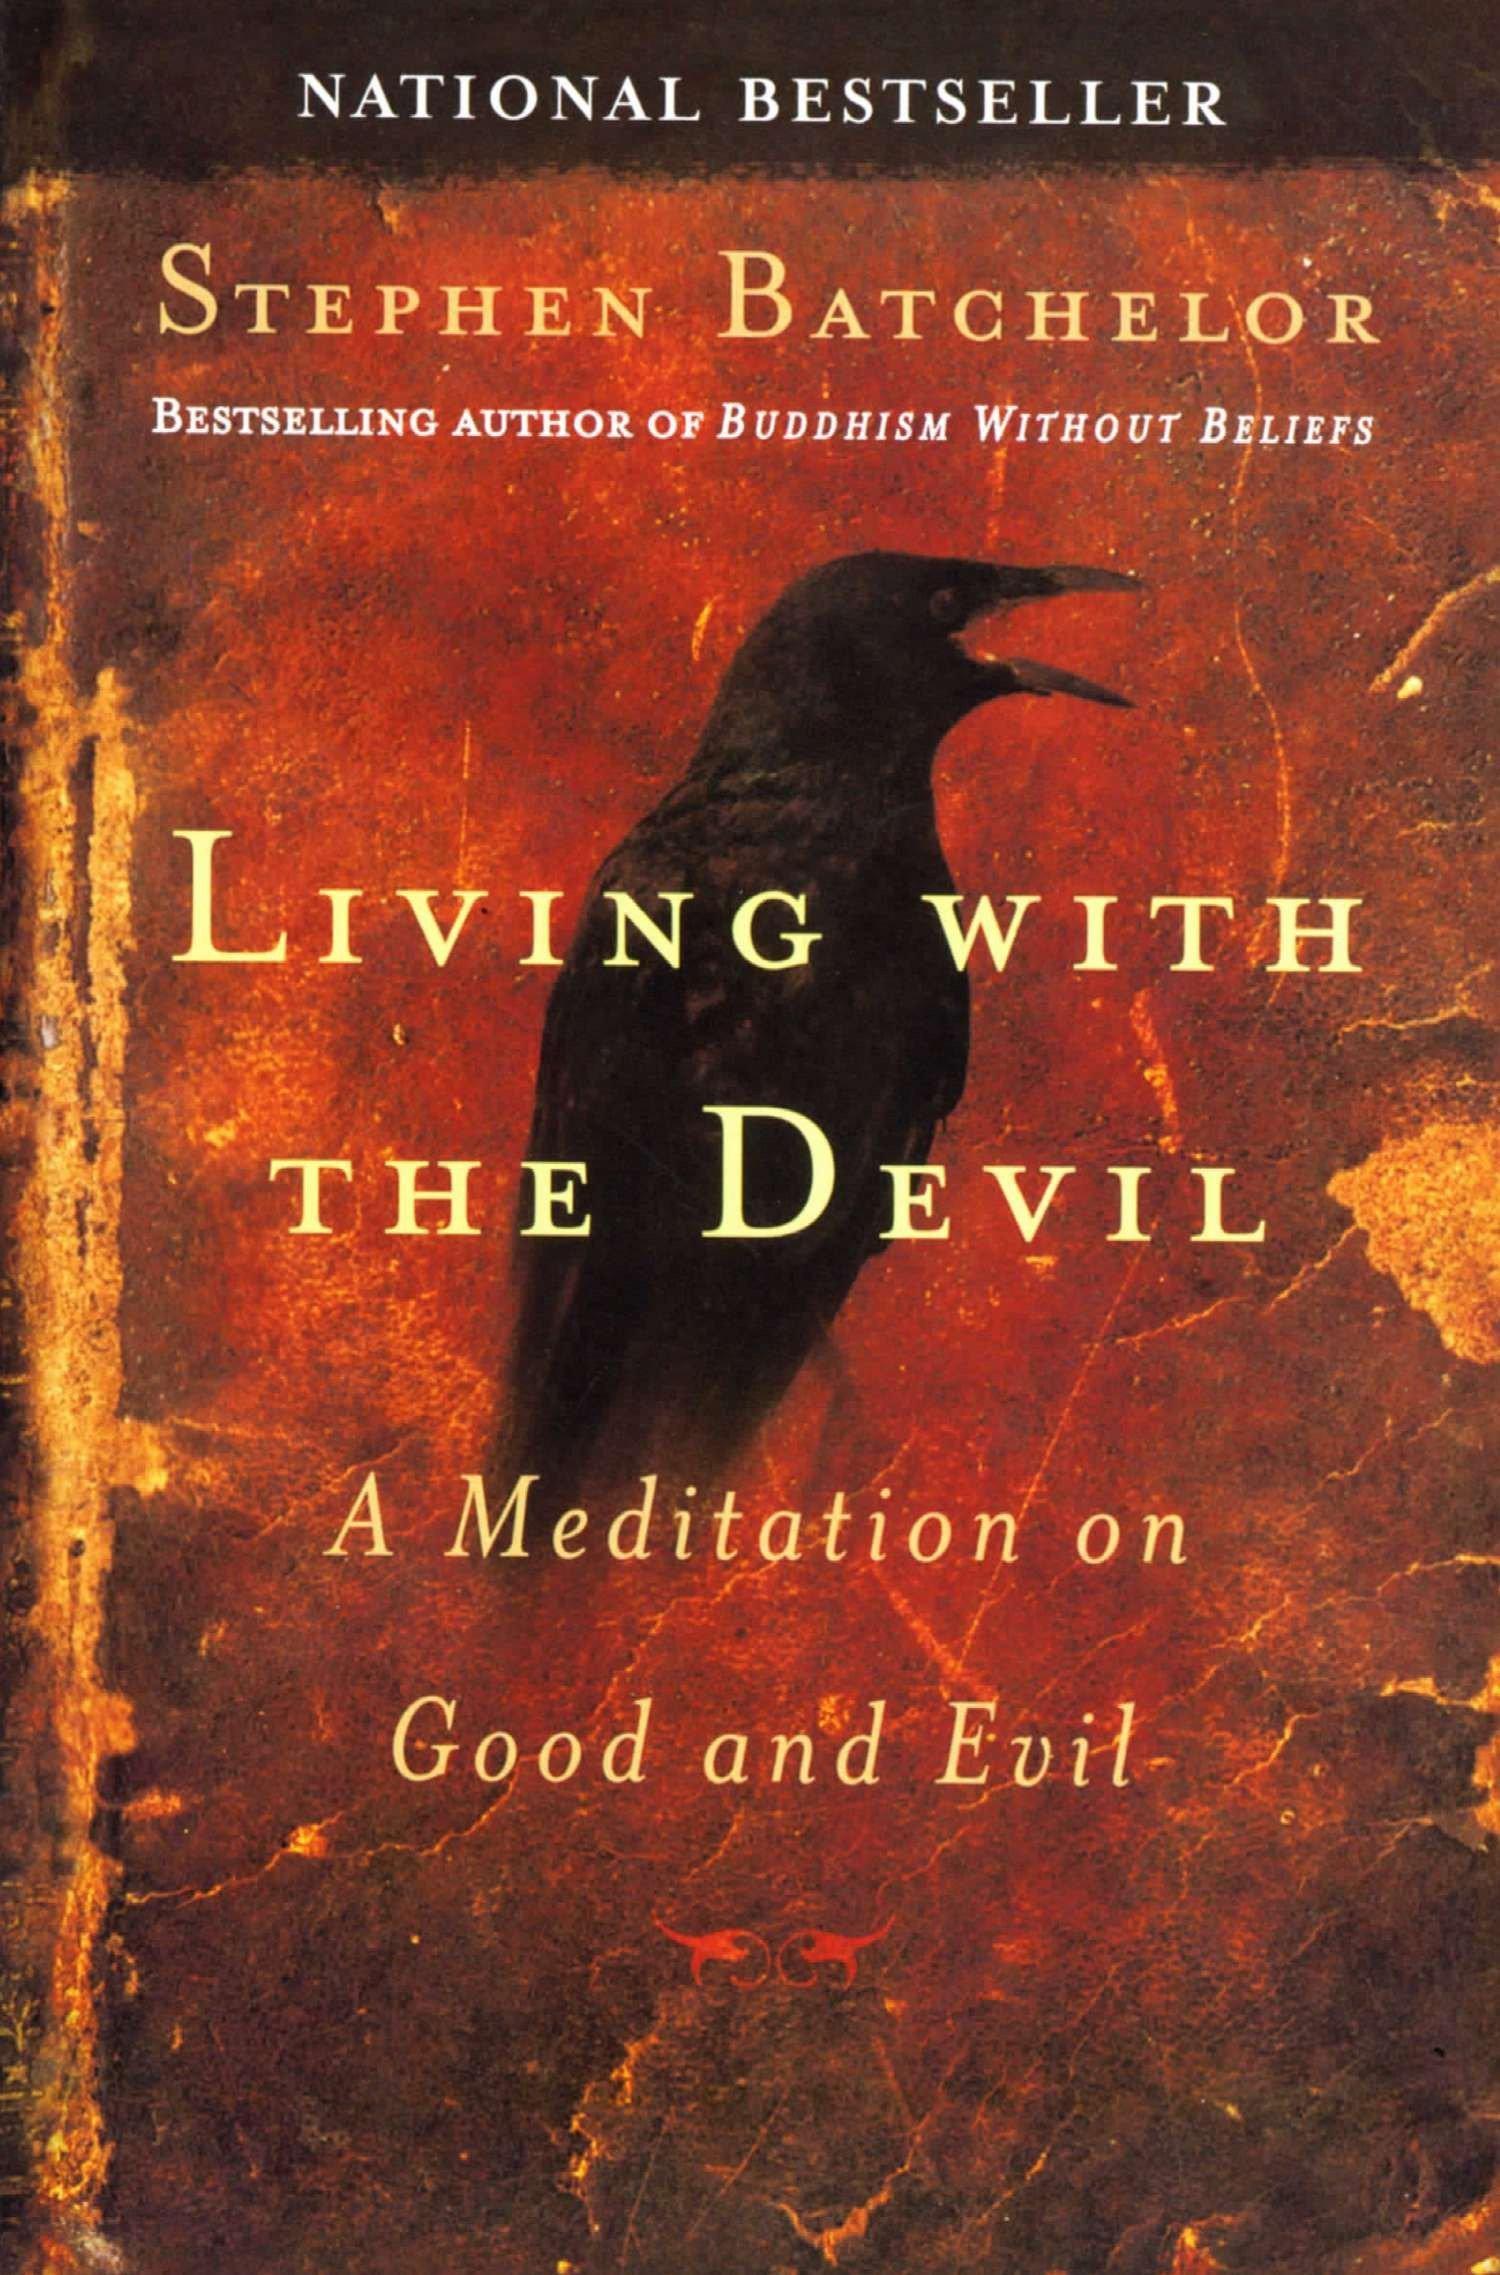 Batchelor Devil cover art